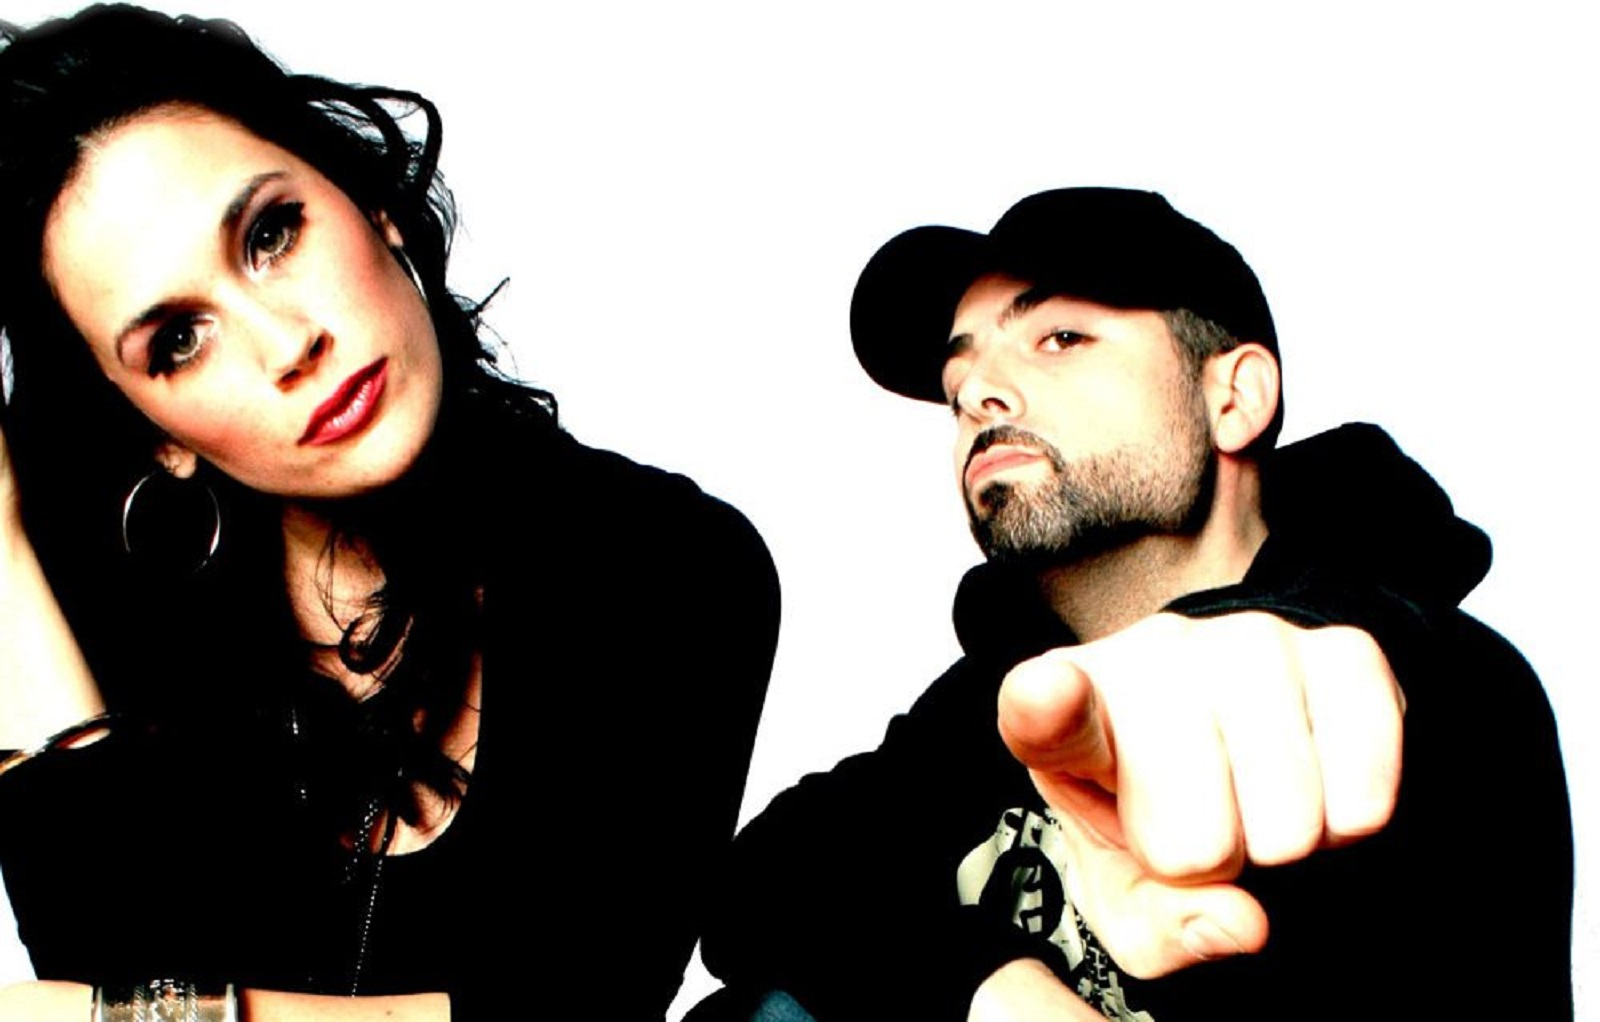 Buffalo's Breakerbox: Singer Christina DeNee, left, and drummer Scott Calandra.